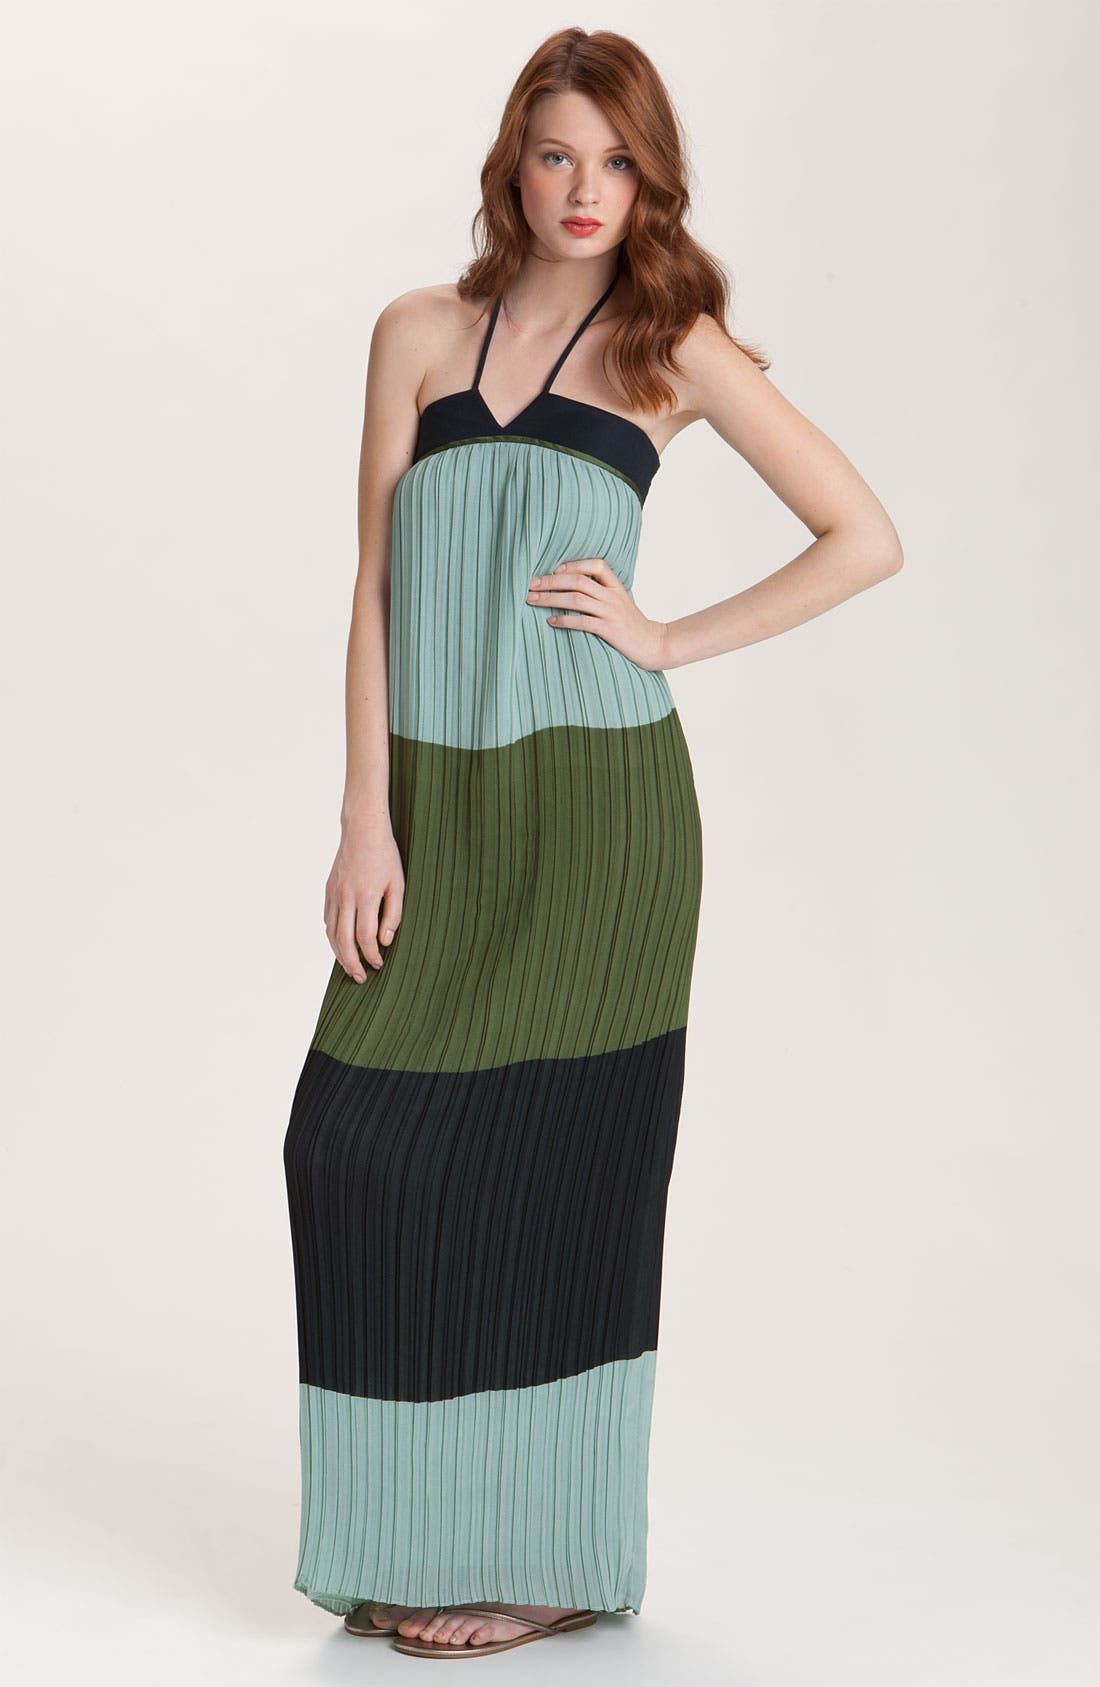 Alternate Image 1 Selected - Derek Lam 10 Crosby Pleated Colorblock Halter Maxi Dress